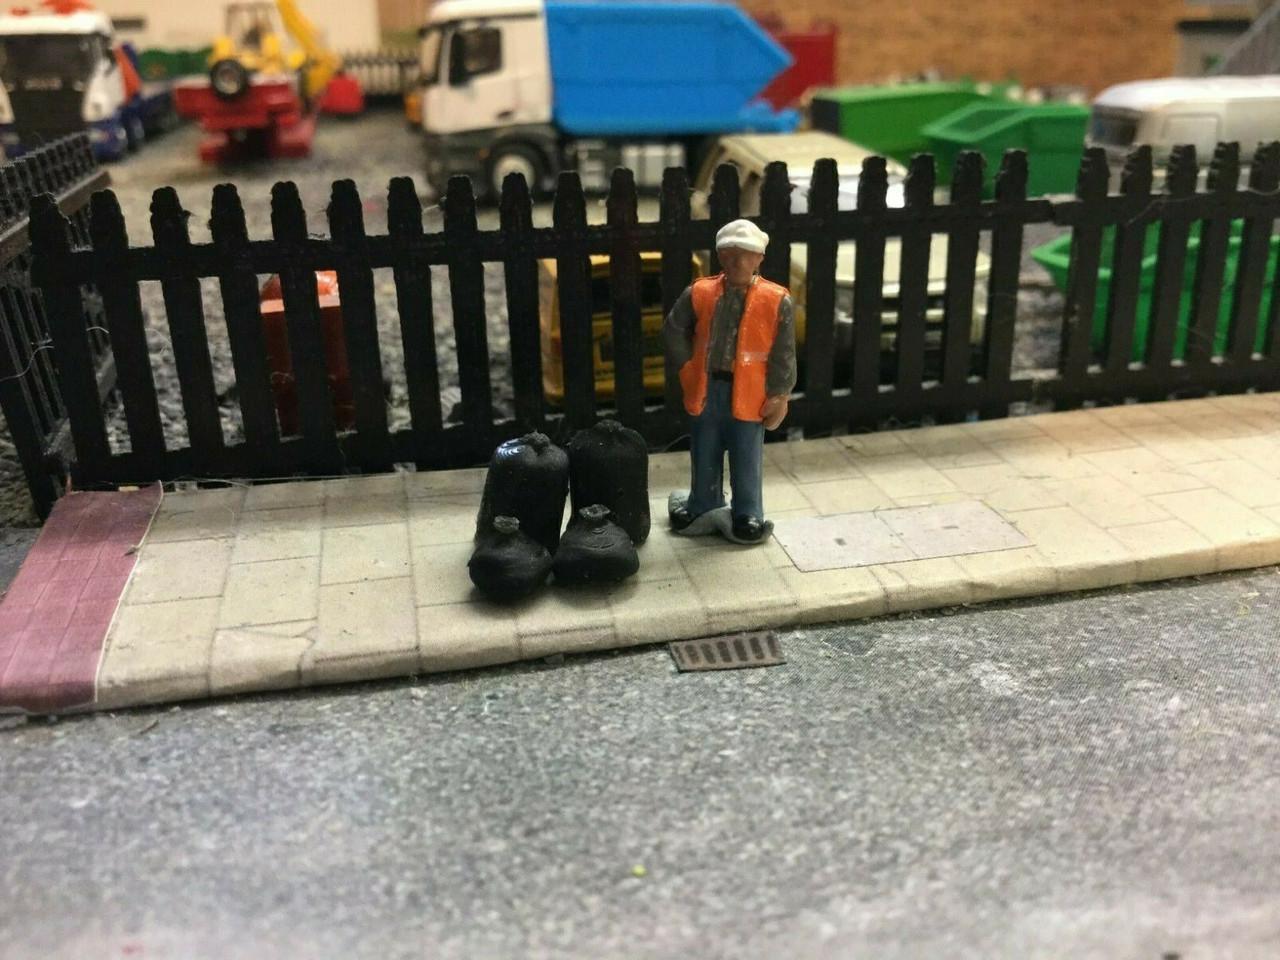 00 gauge 3D printed Bin Bags 9pkt